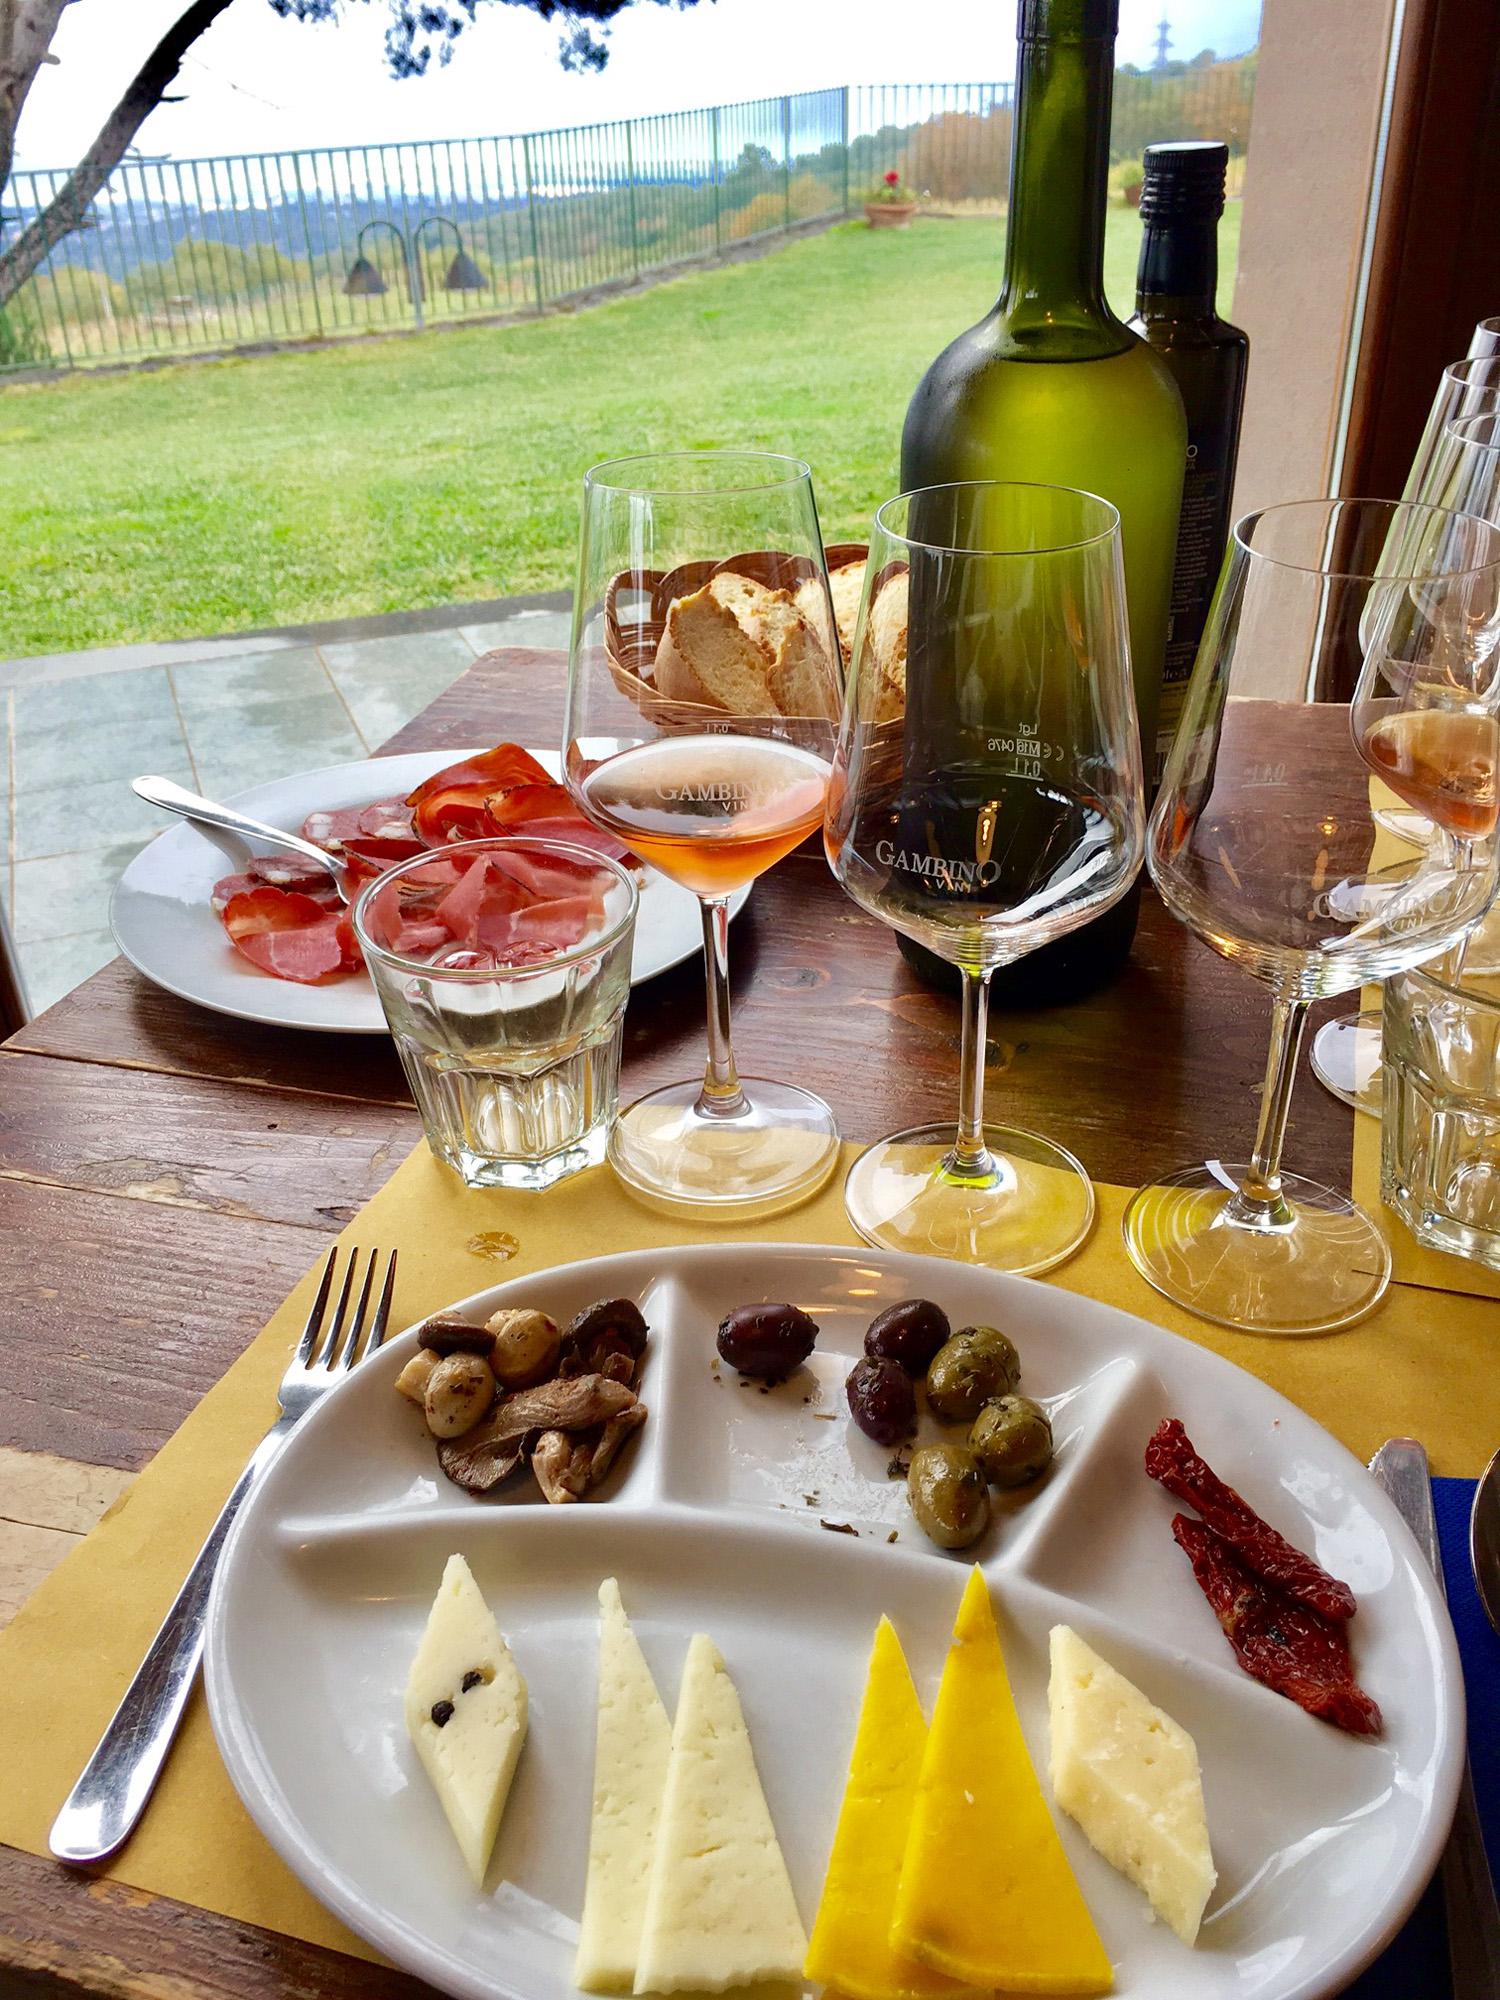 Lunch at Gambino Winery